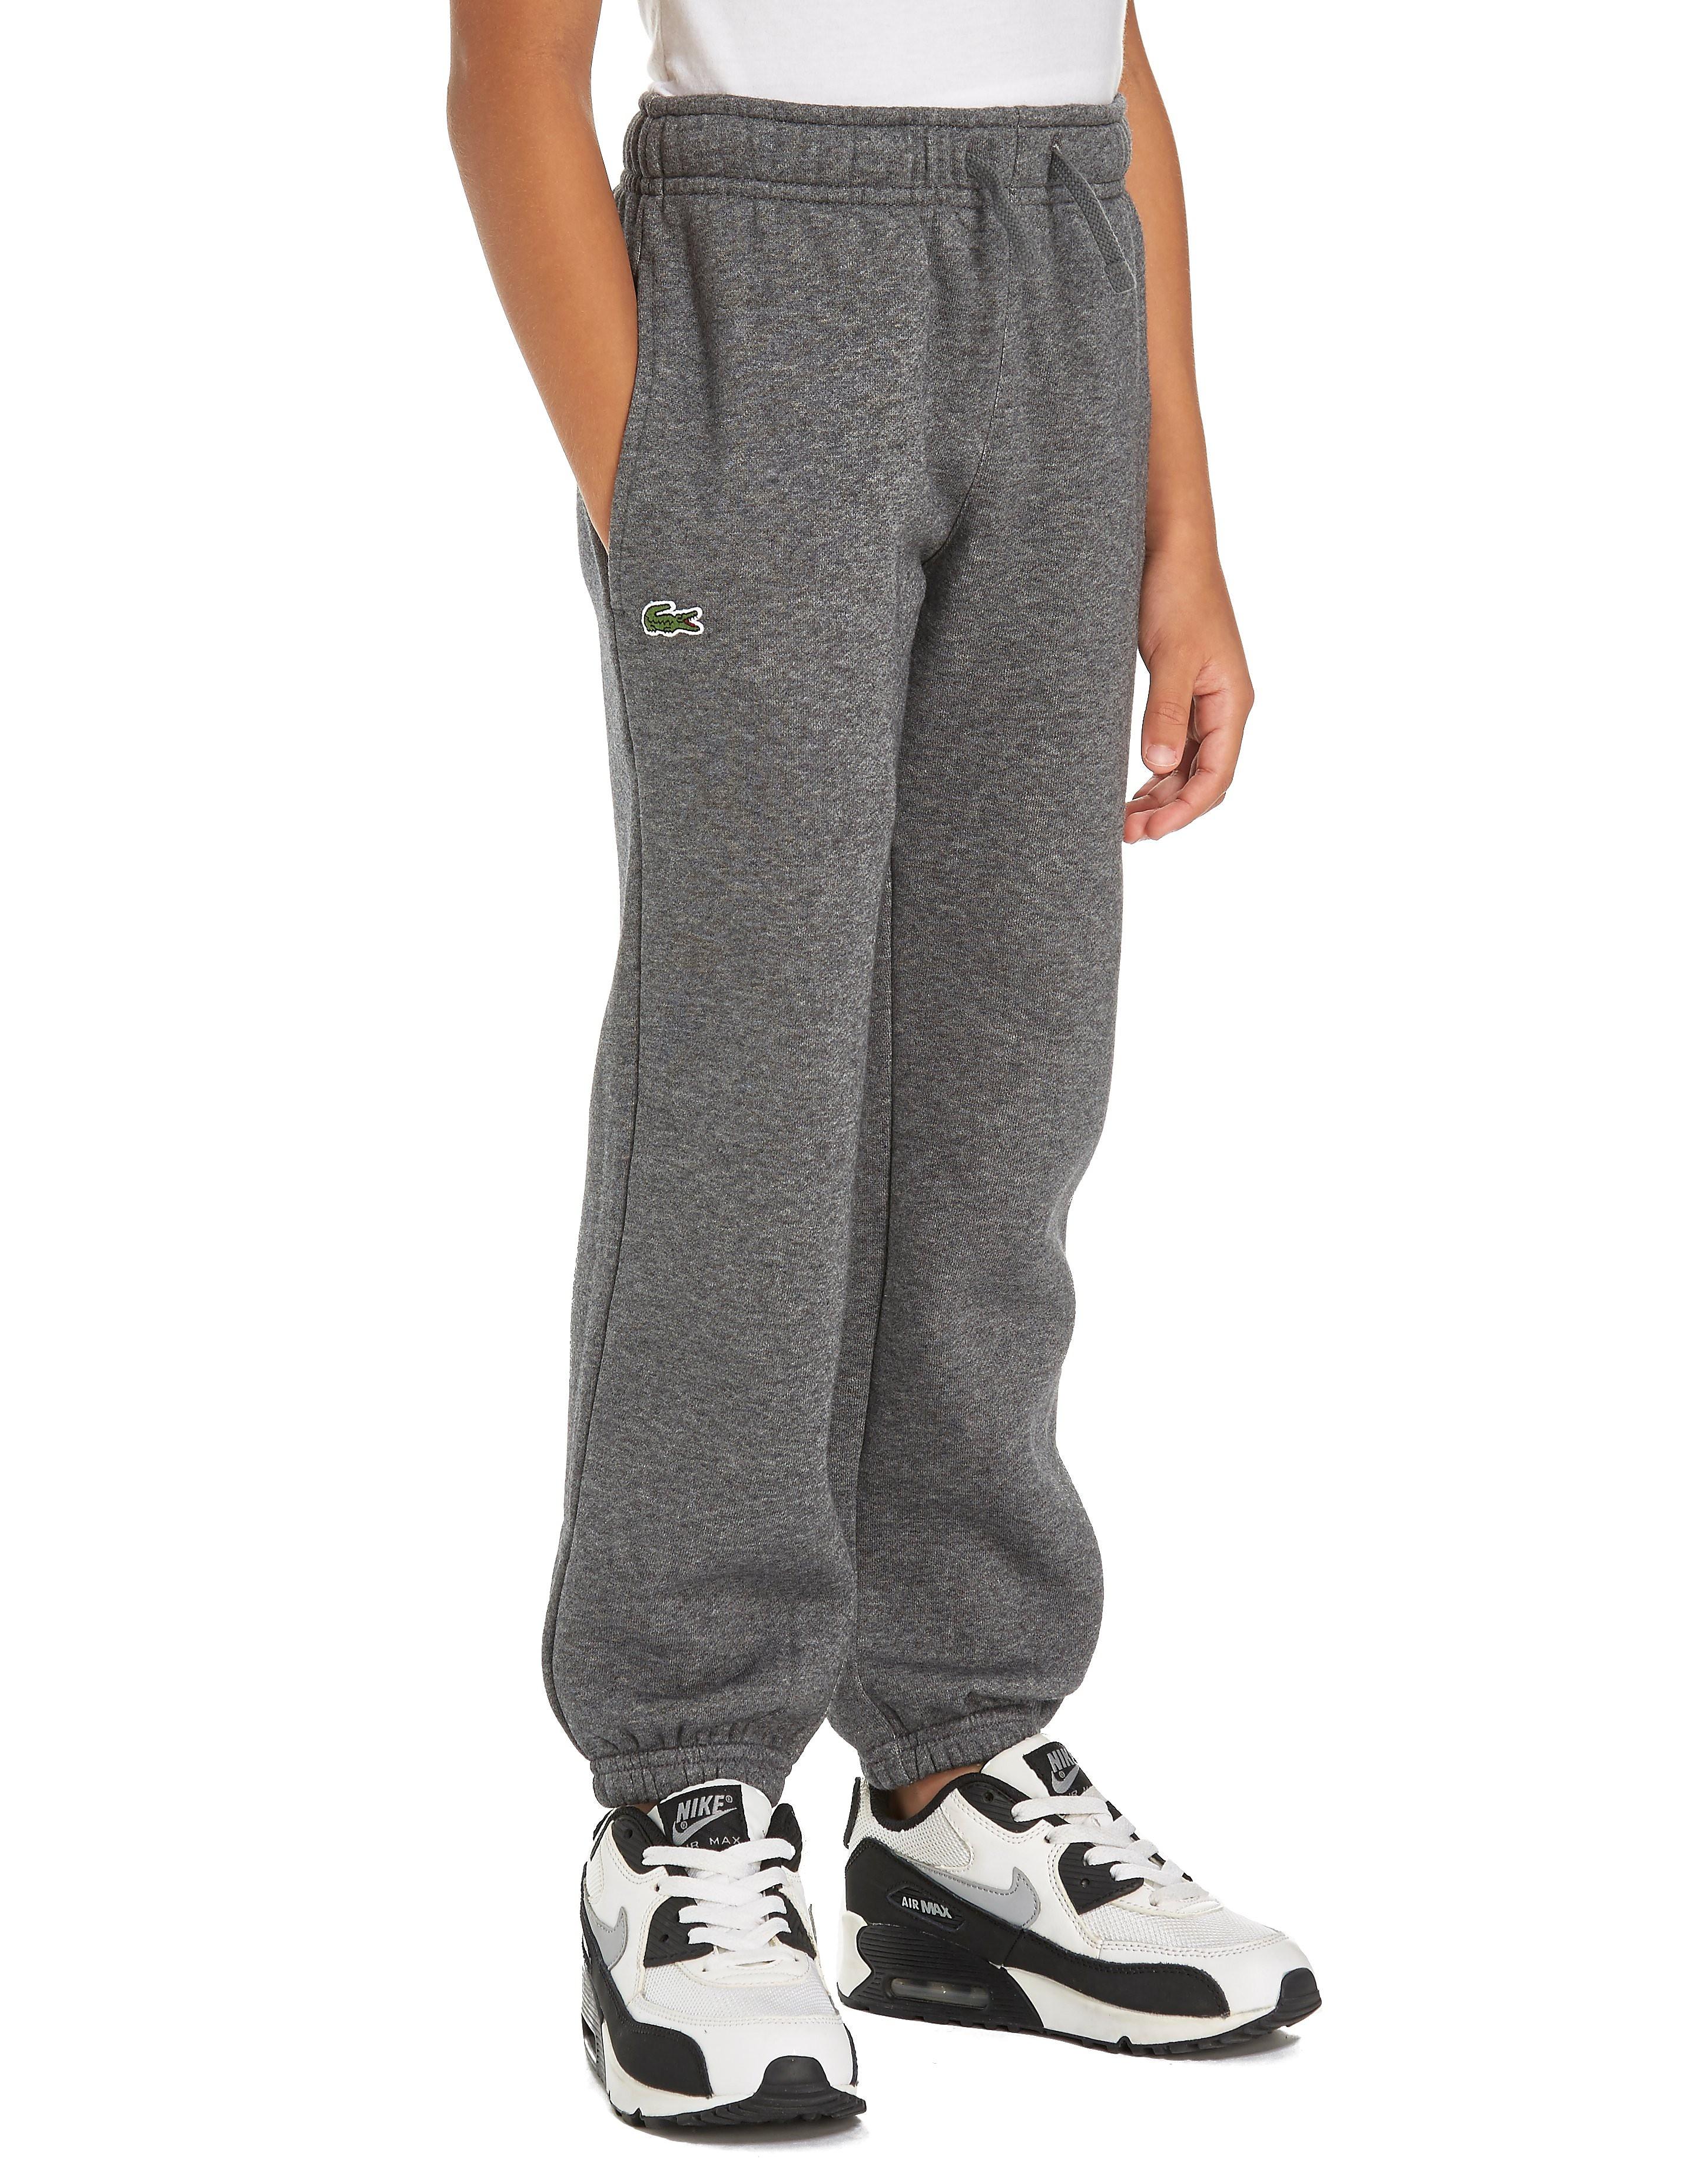 Lacoste Small Logo Track Pants Children